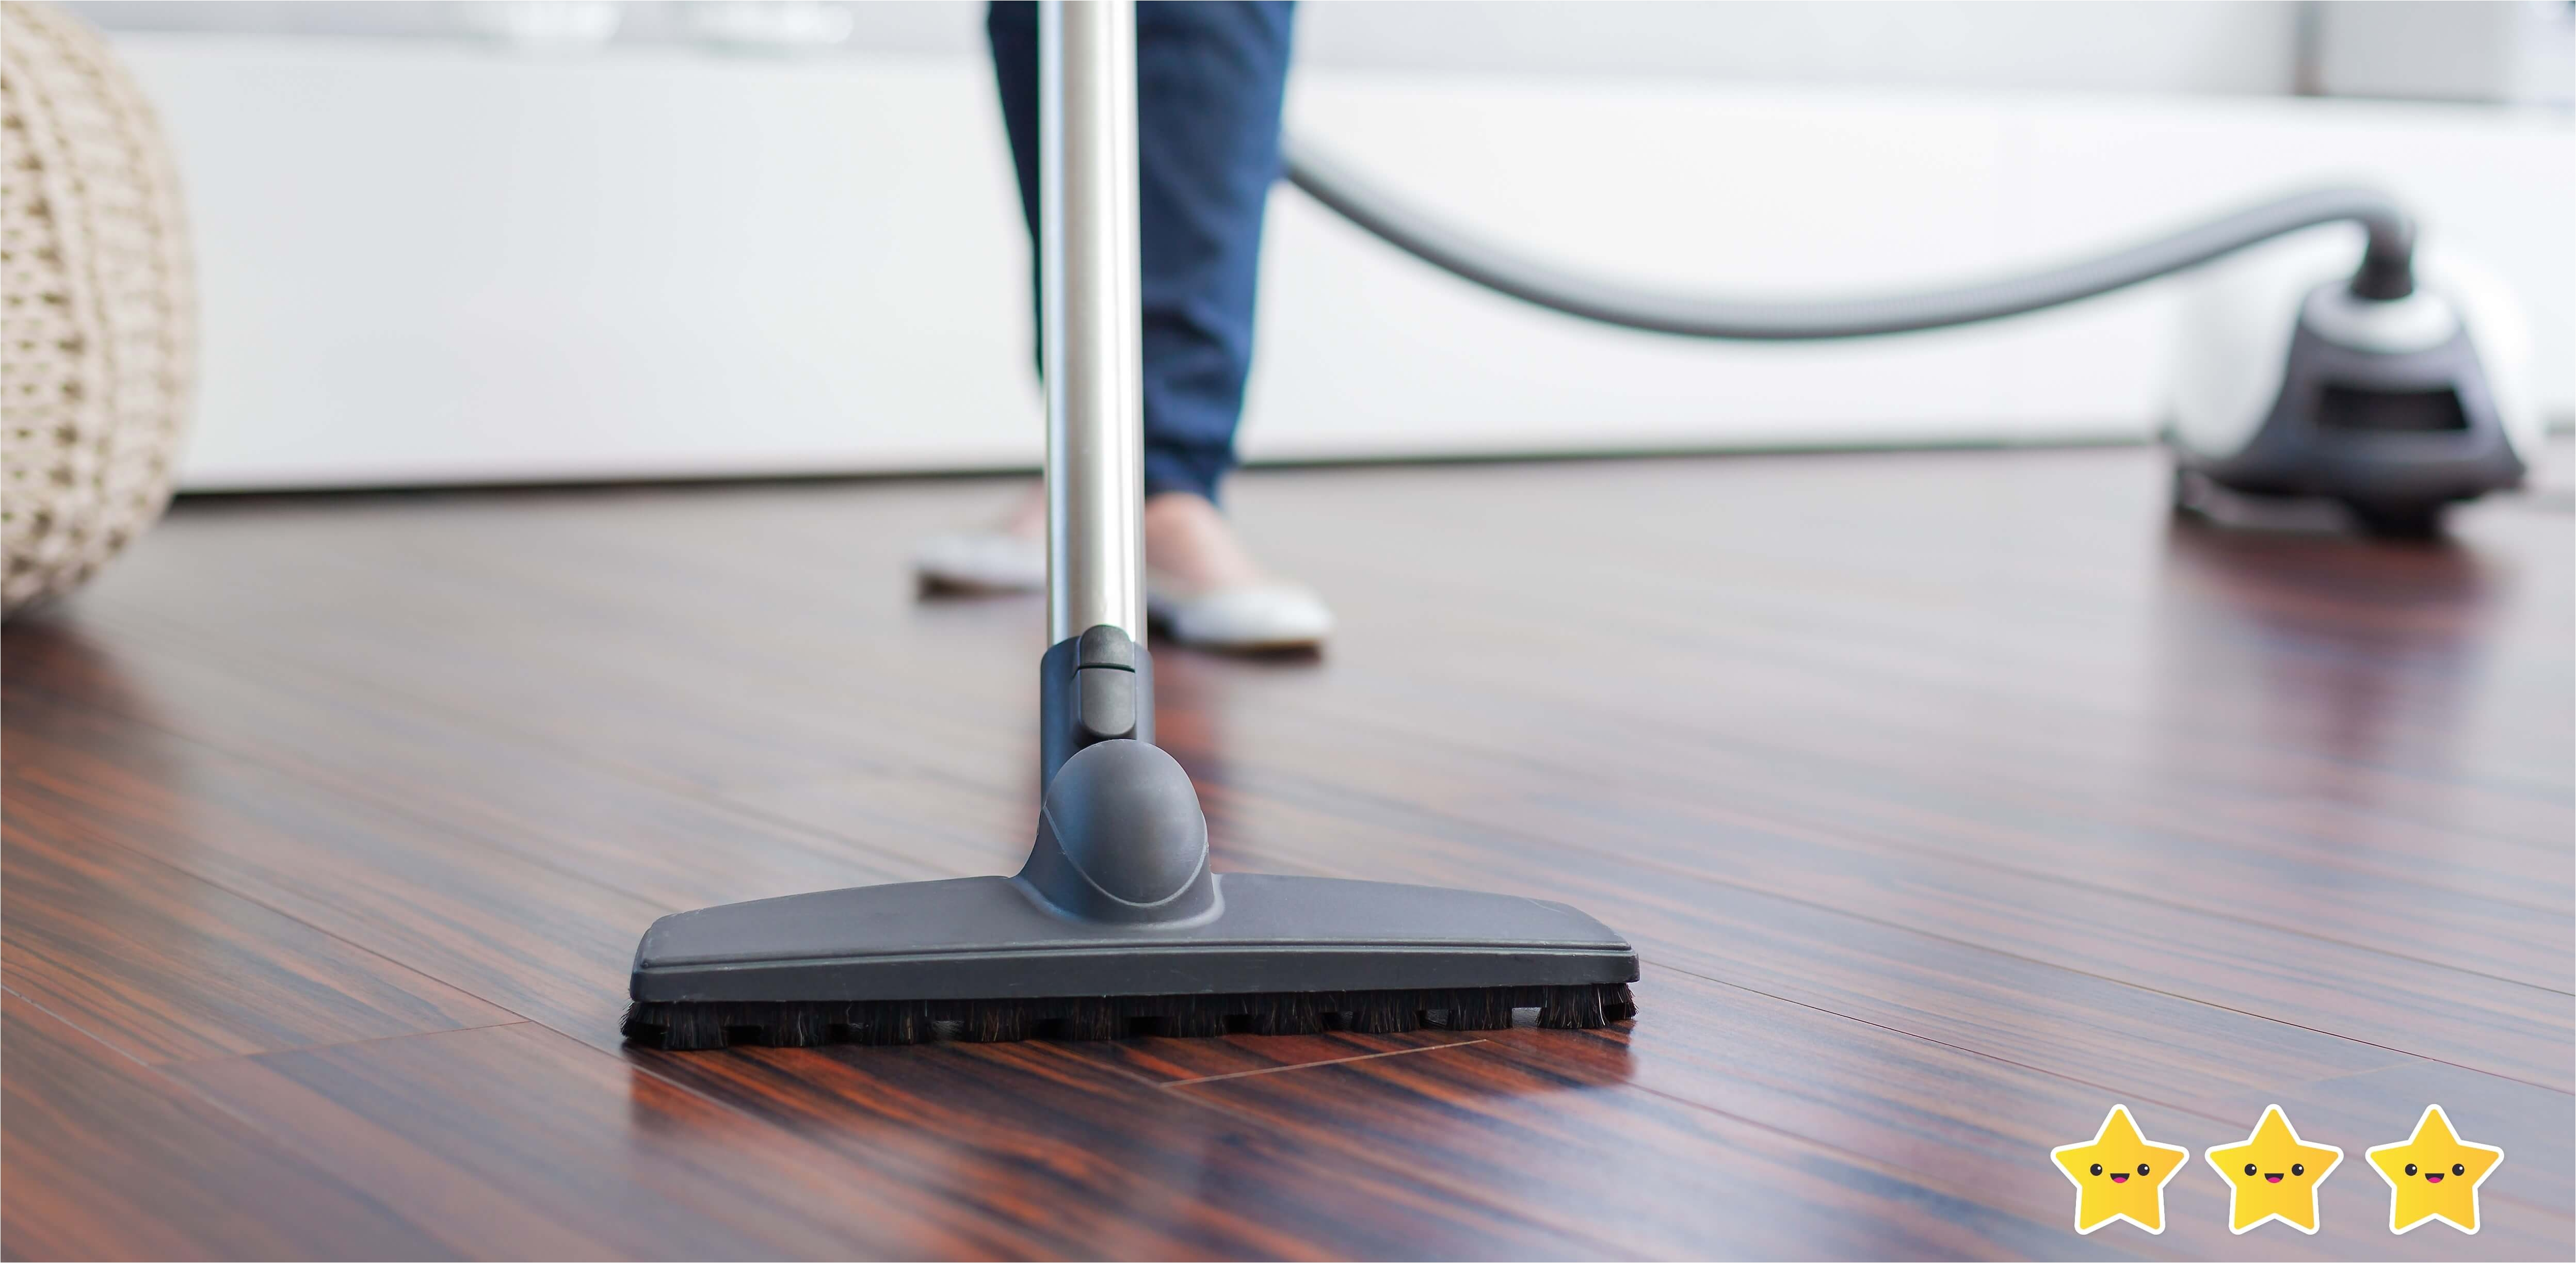 Bissell Poweredge Pet Hard Floor Vacuum top 5 Best Vacuum for Laminate Floors Reviews 2018 Large Reviews